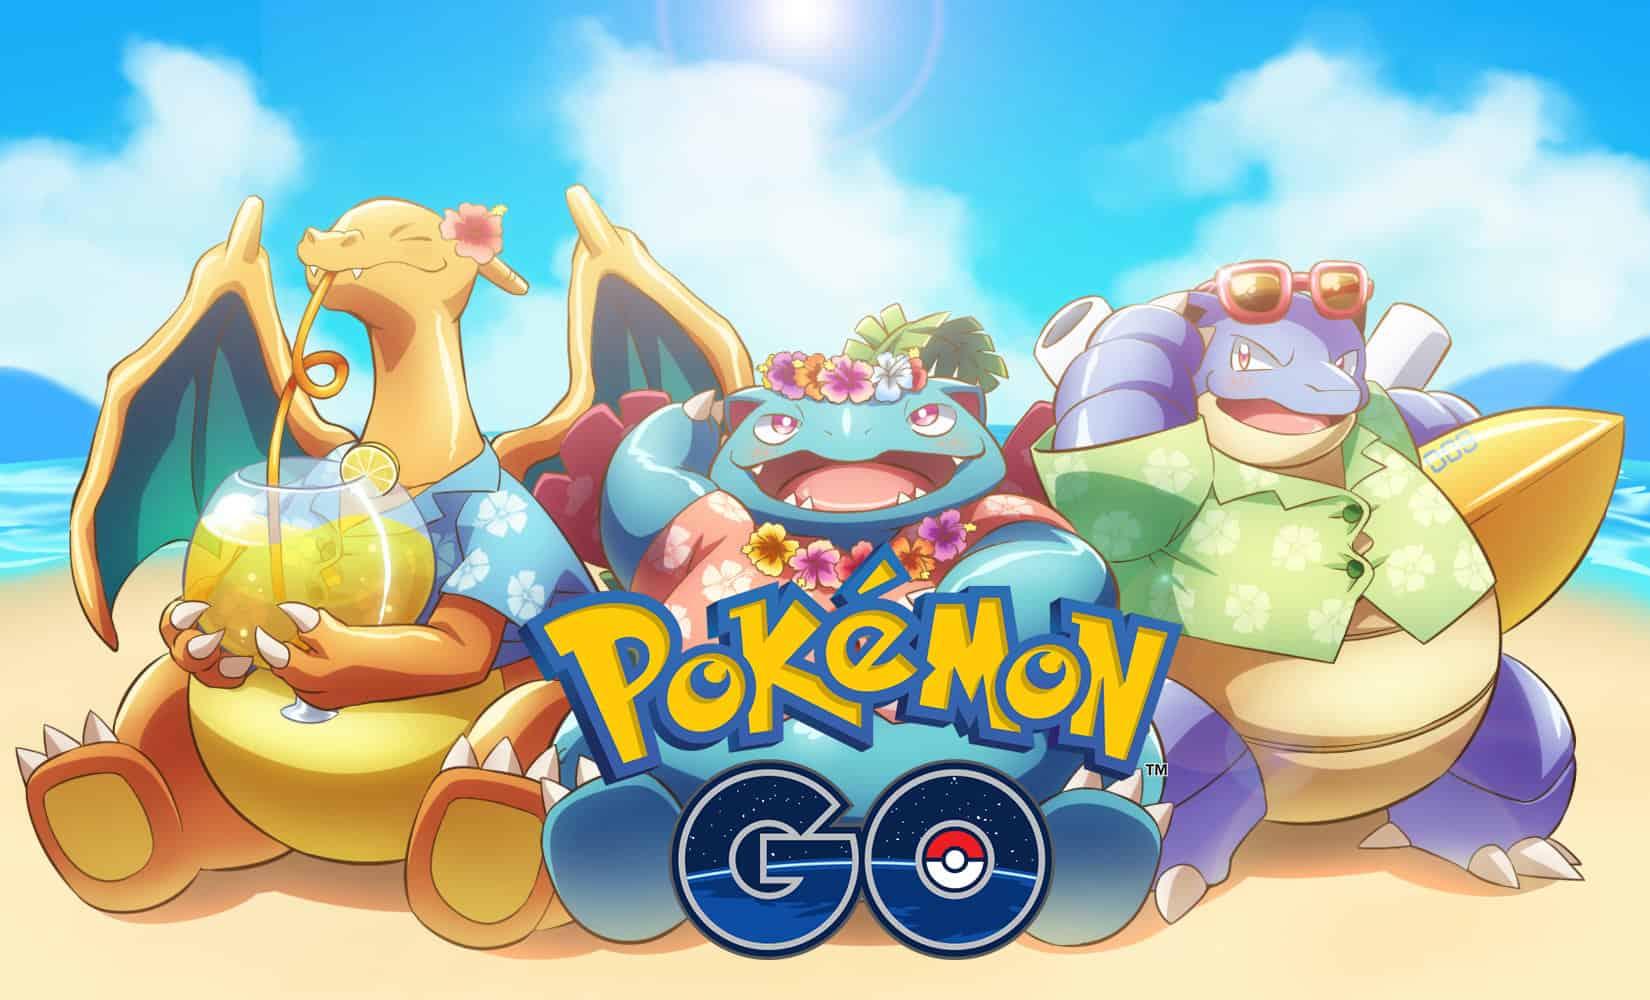 Pokemon GO 新阿羅拉寶可夢/7-8月社群日(傳聞) ⋆ Pokemon Hubs 寶可夢 GO資訊